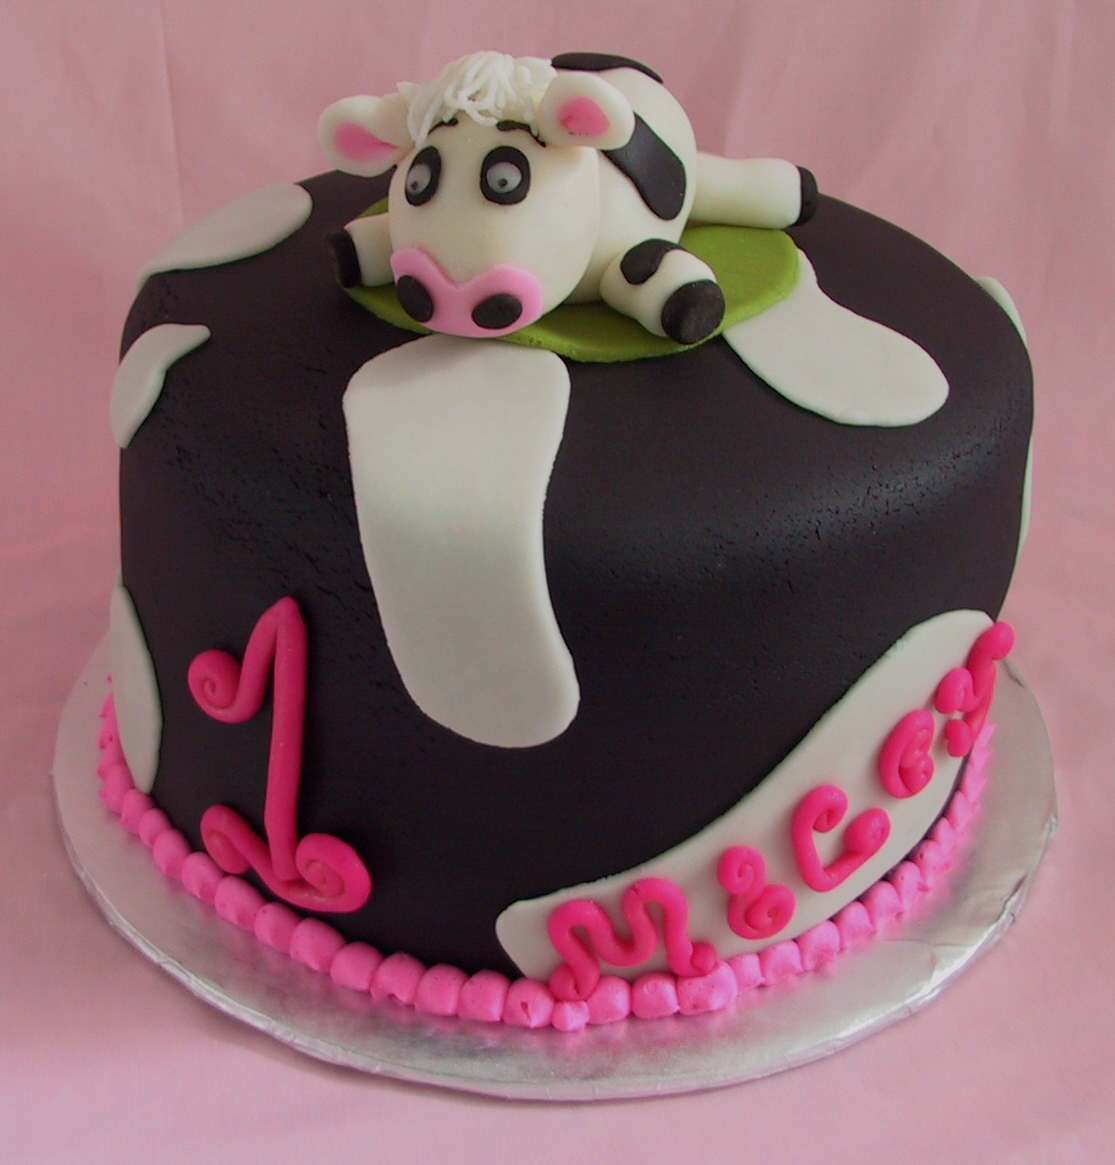 1 cow cake